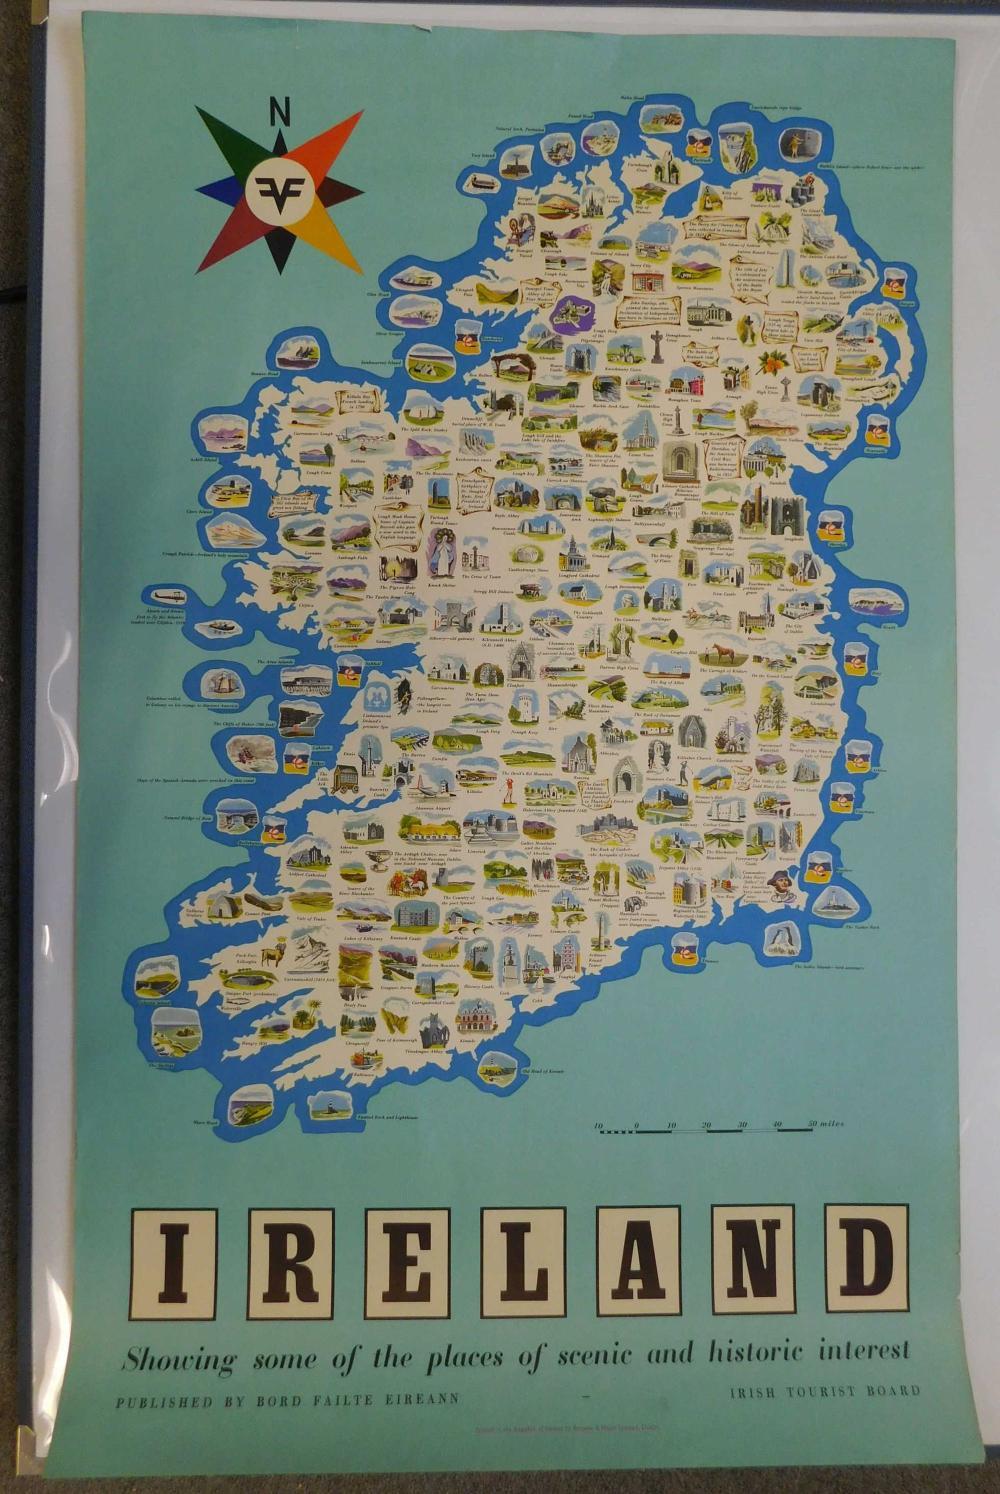 Vintage Travel Poster. Ireland.